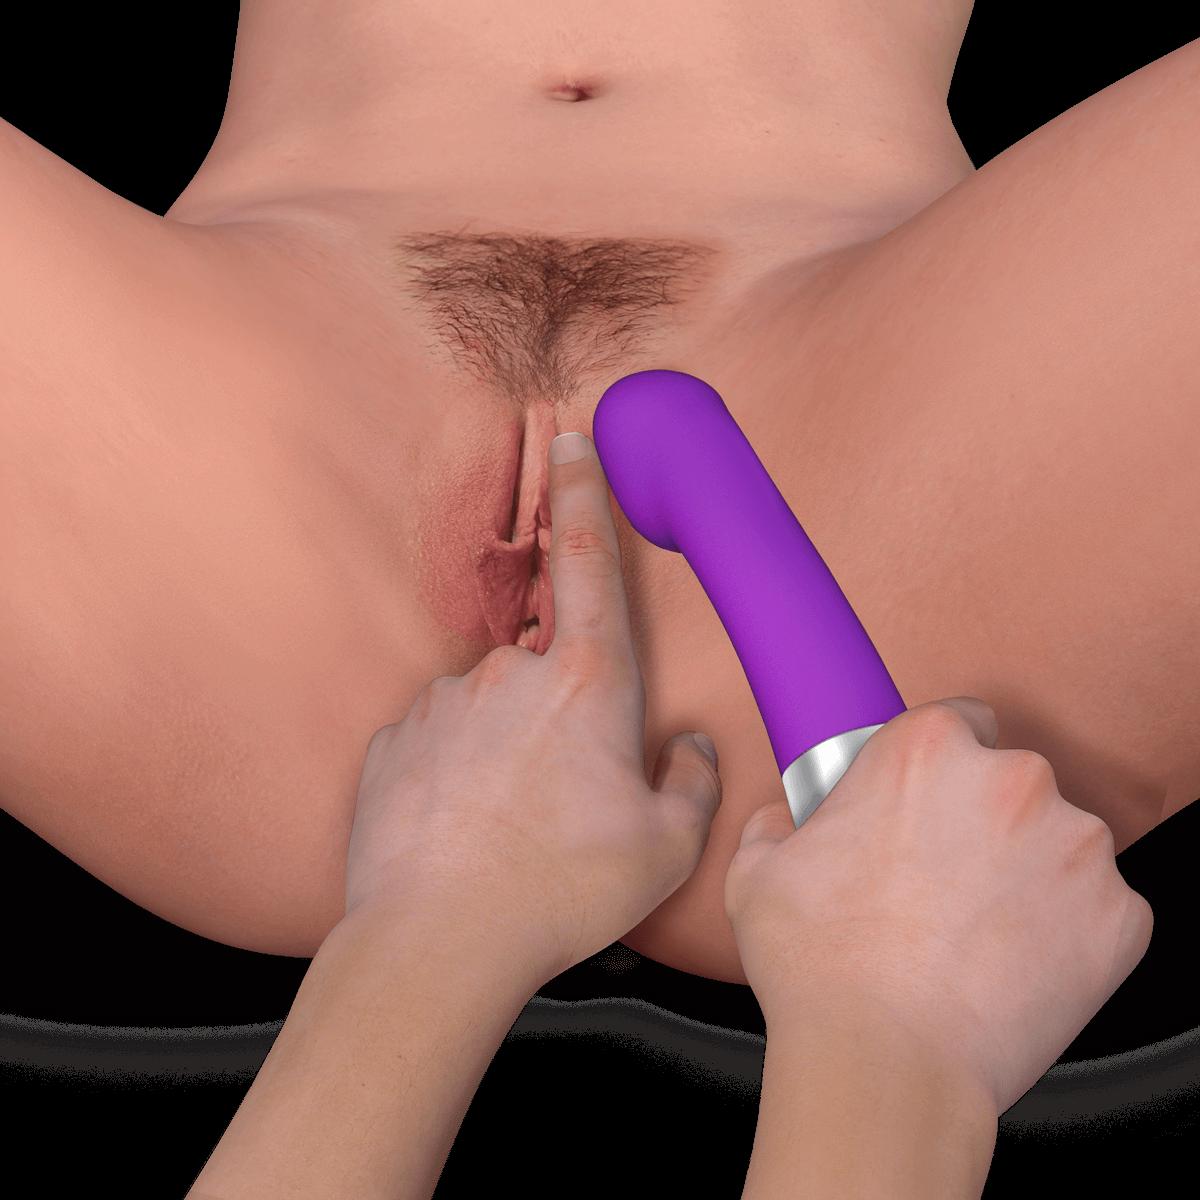 Clitoral Stimulation Techniques, Sex Positions